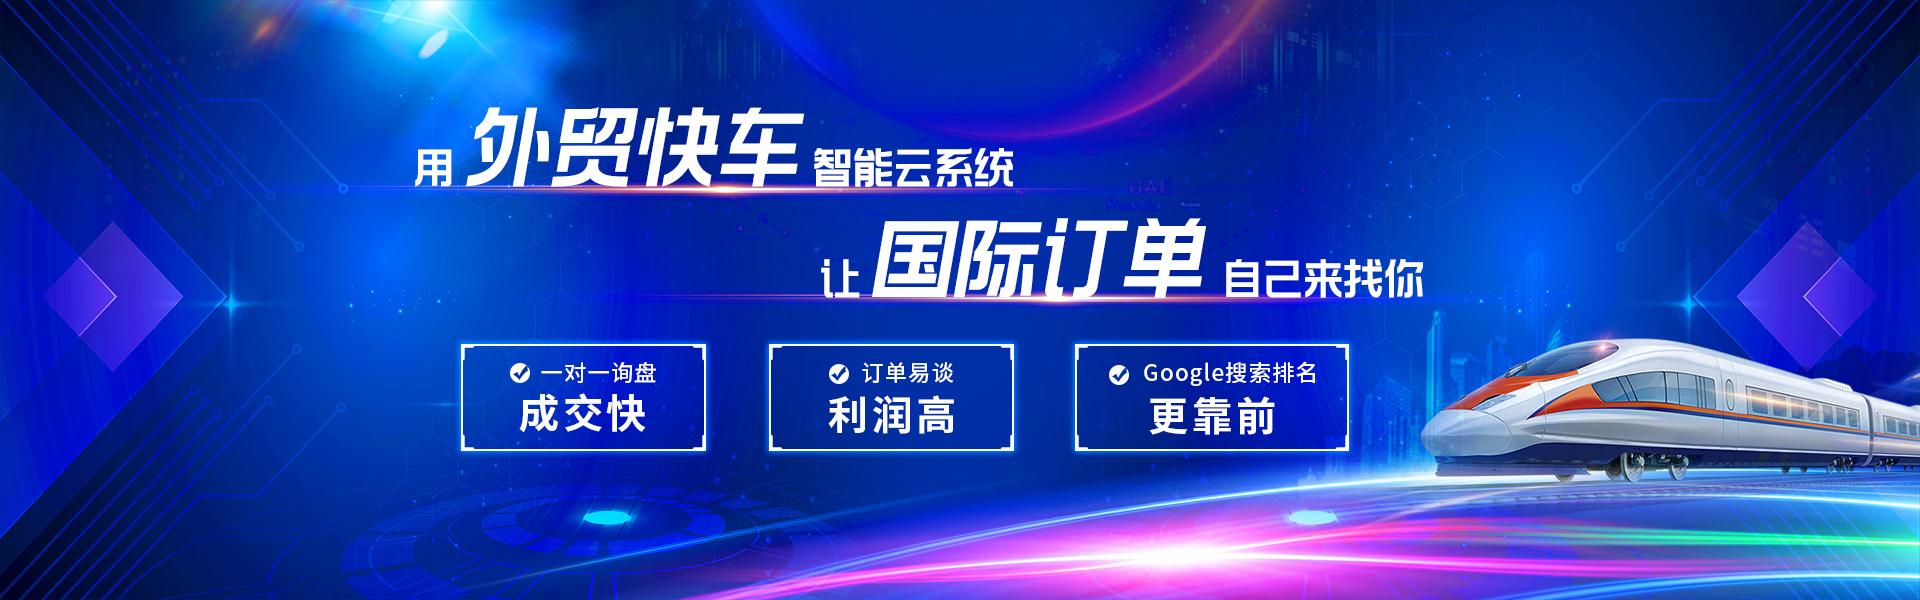 Googe外贸推广优化就选惠州外贸快车智能云系统